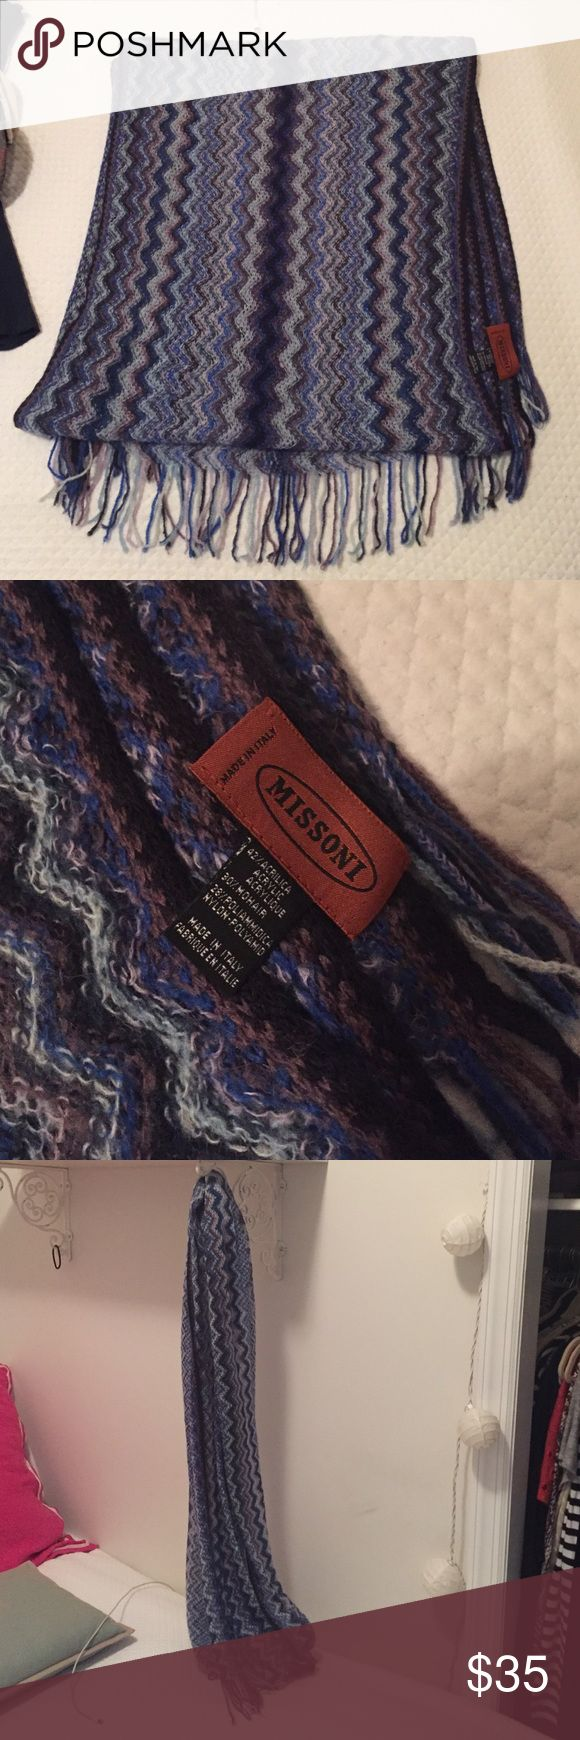 Missoni Scarf Blue zig-zag Missoni scarf (42% acrylic 30% mohair 28% nylon) Missoni Accessories Scarves & Wraps